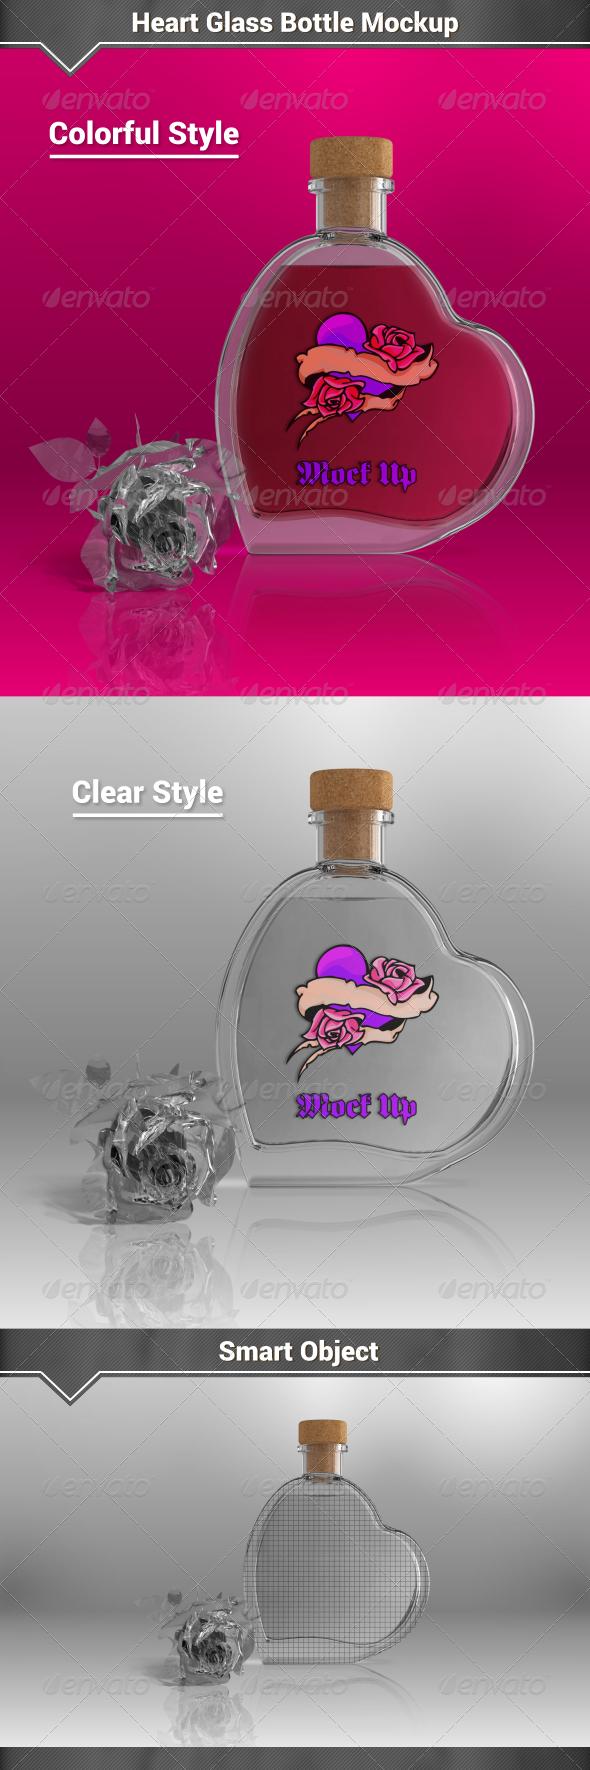 Heart Glass Bottle Mockup